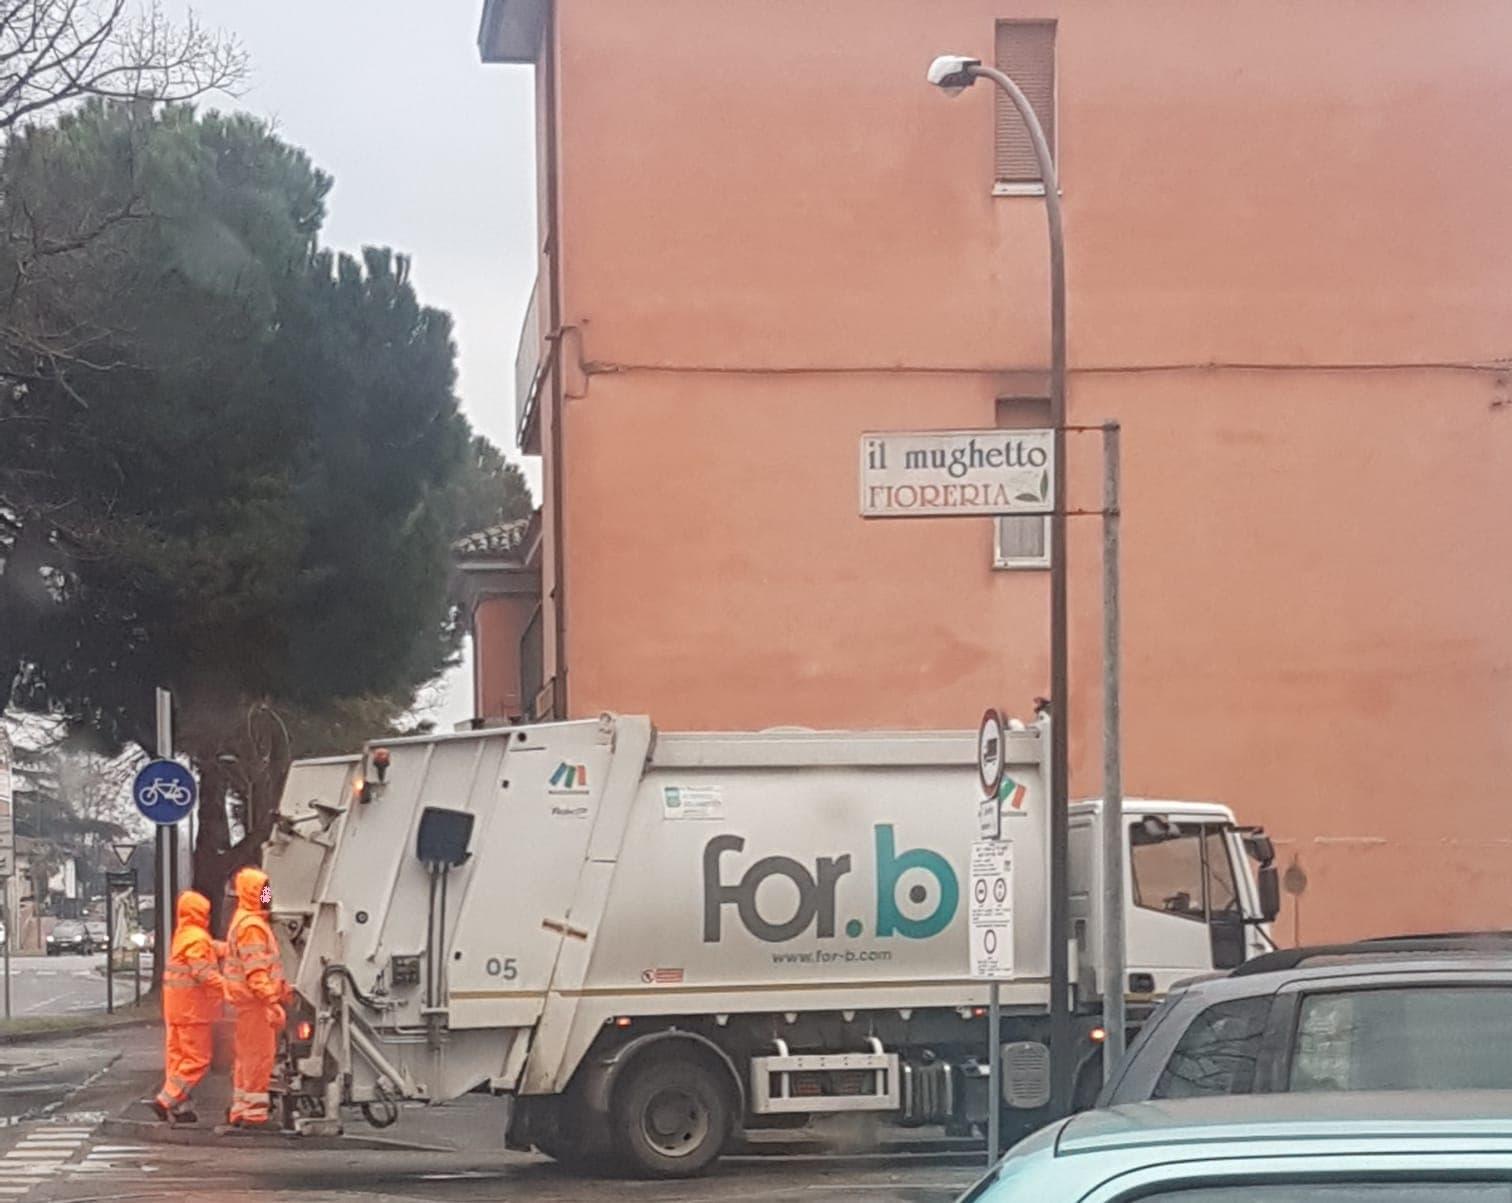 raccolta-rifiuti-a-forlì alea forb